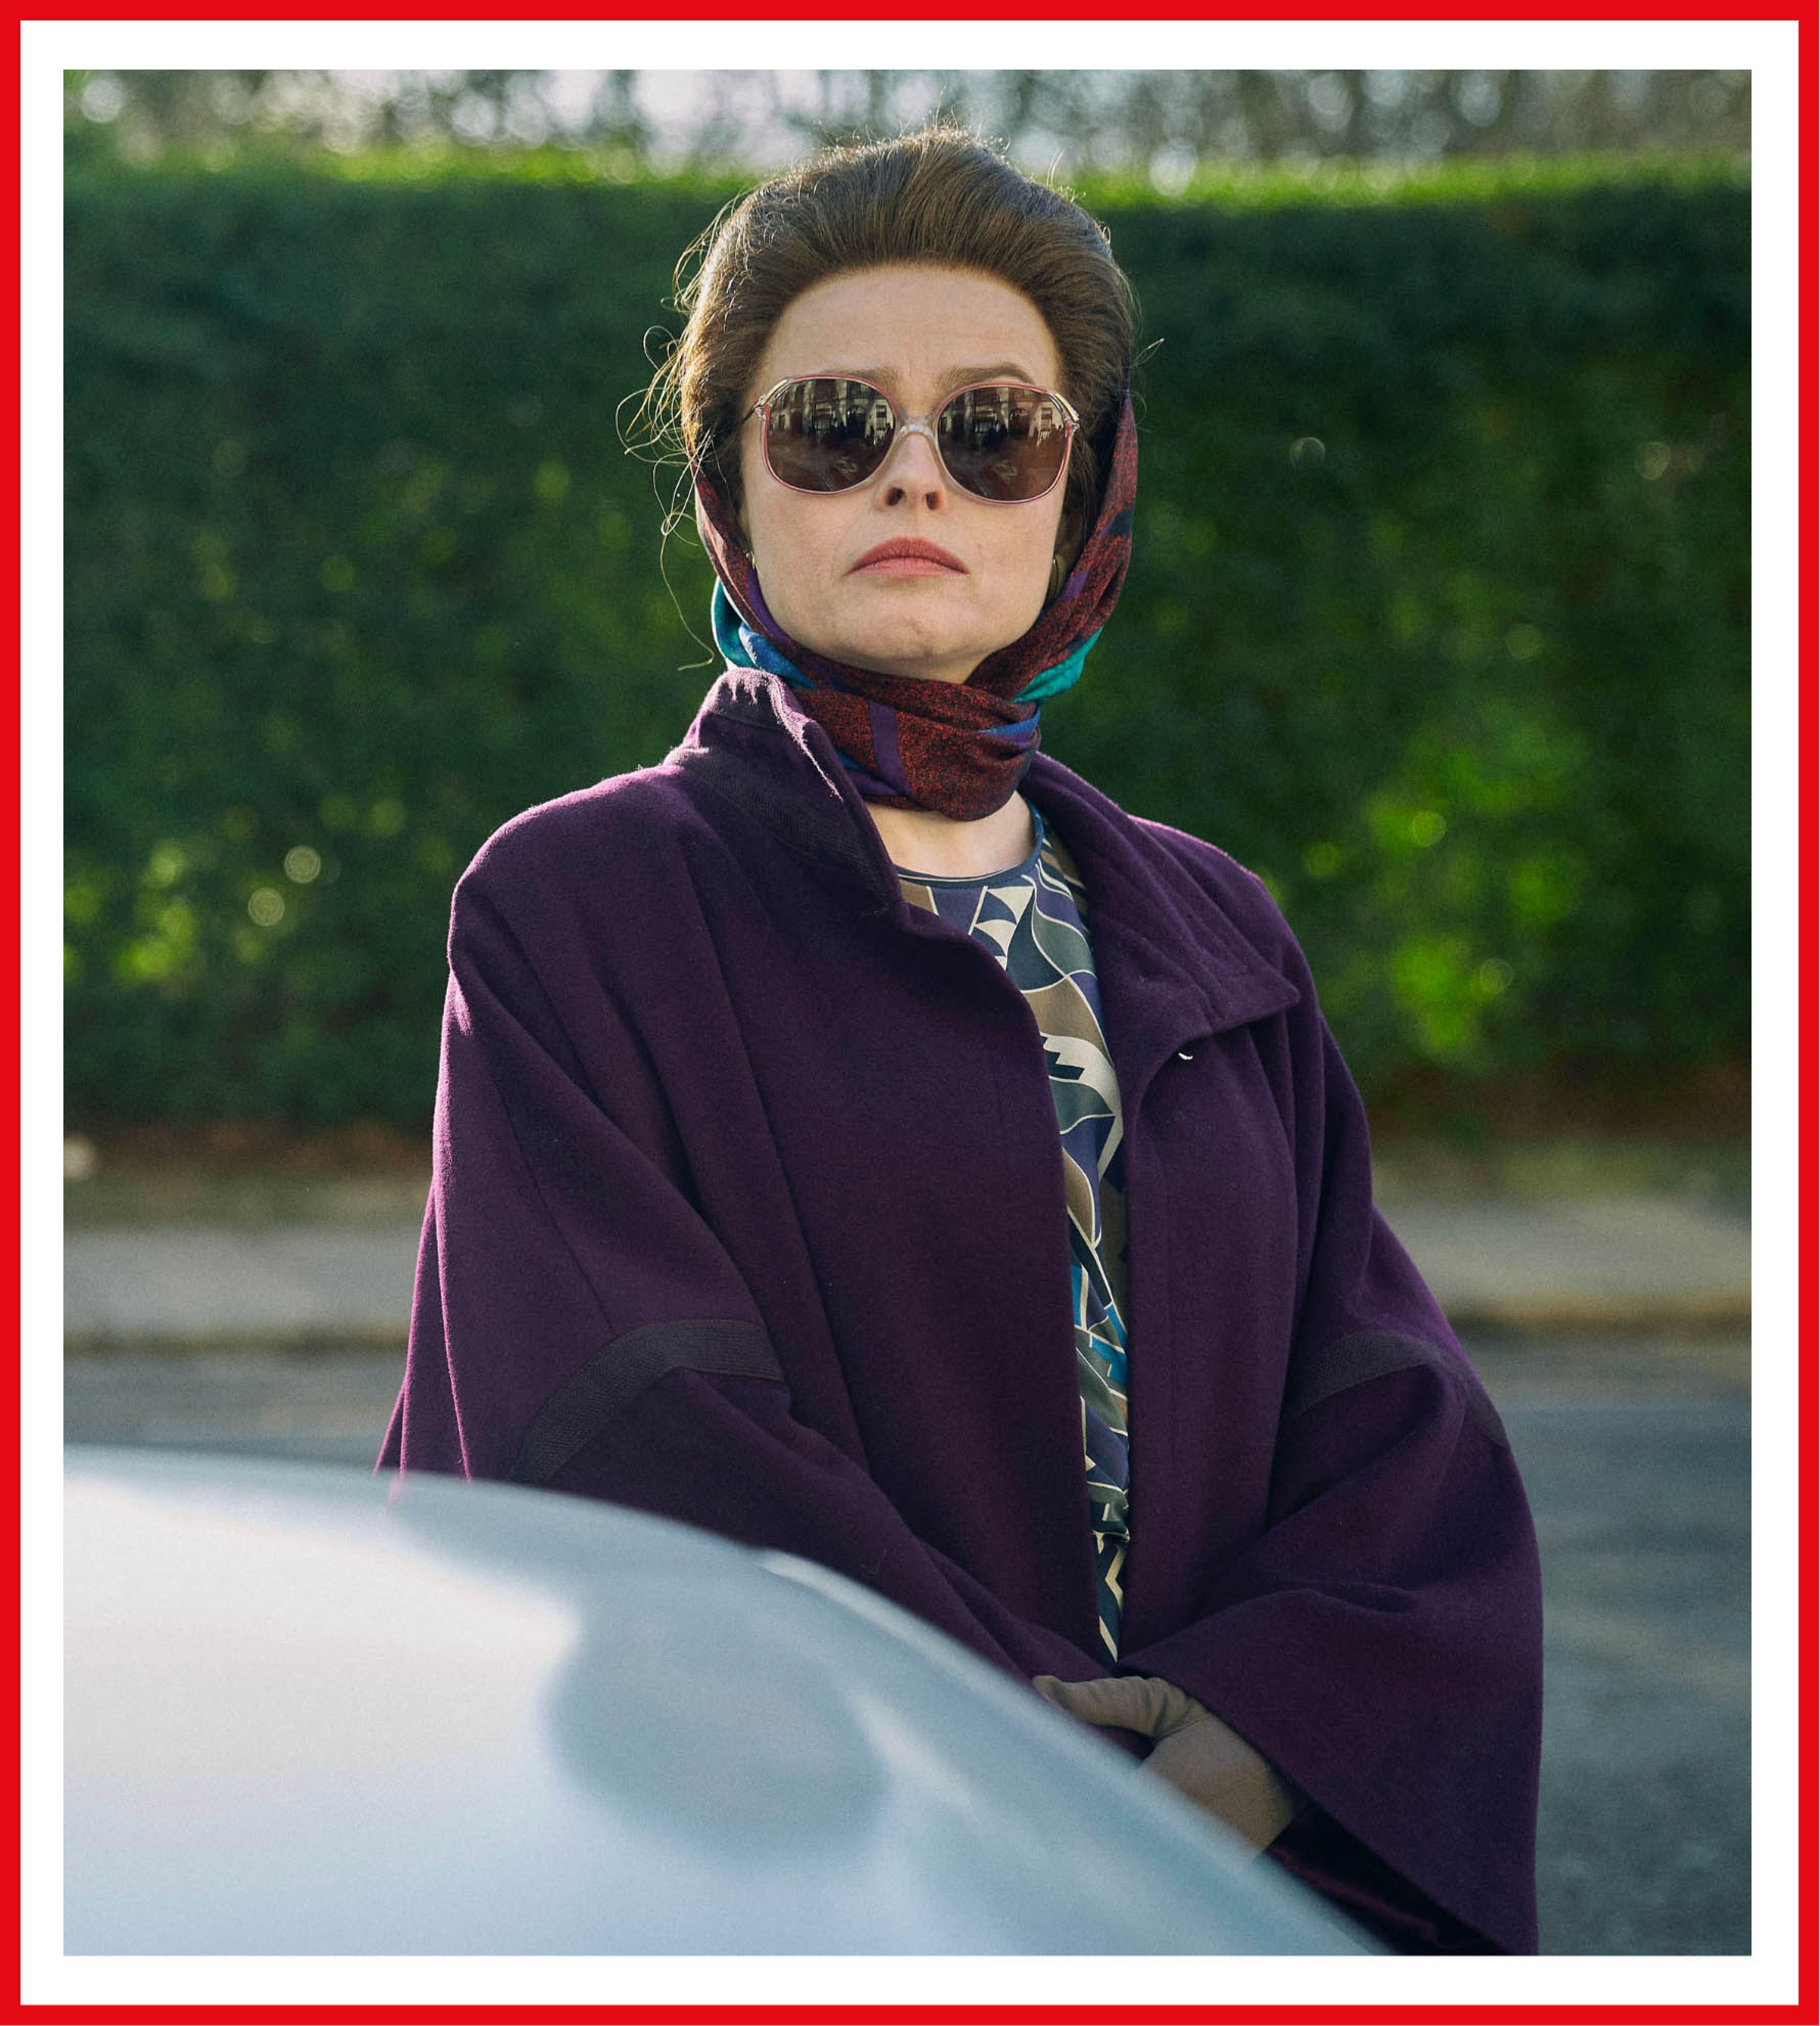 Helena Bonham Carter as Princess Margaret looks chic in this deep-purple get-up.